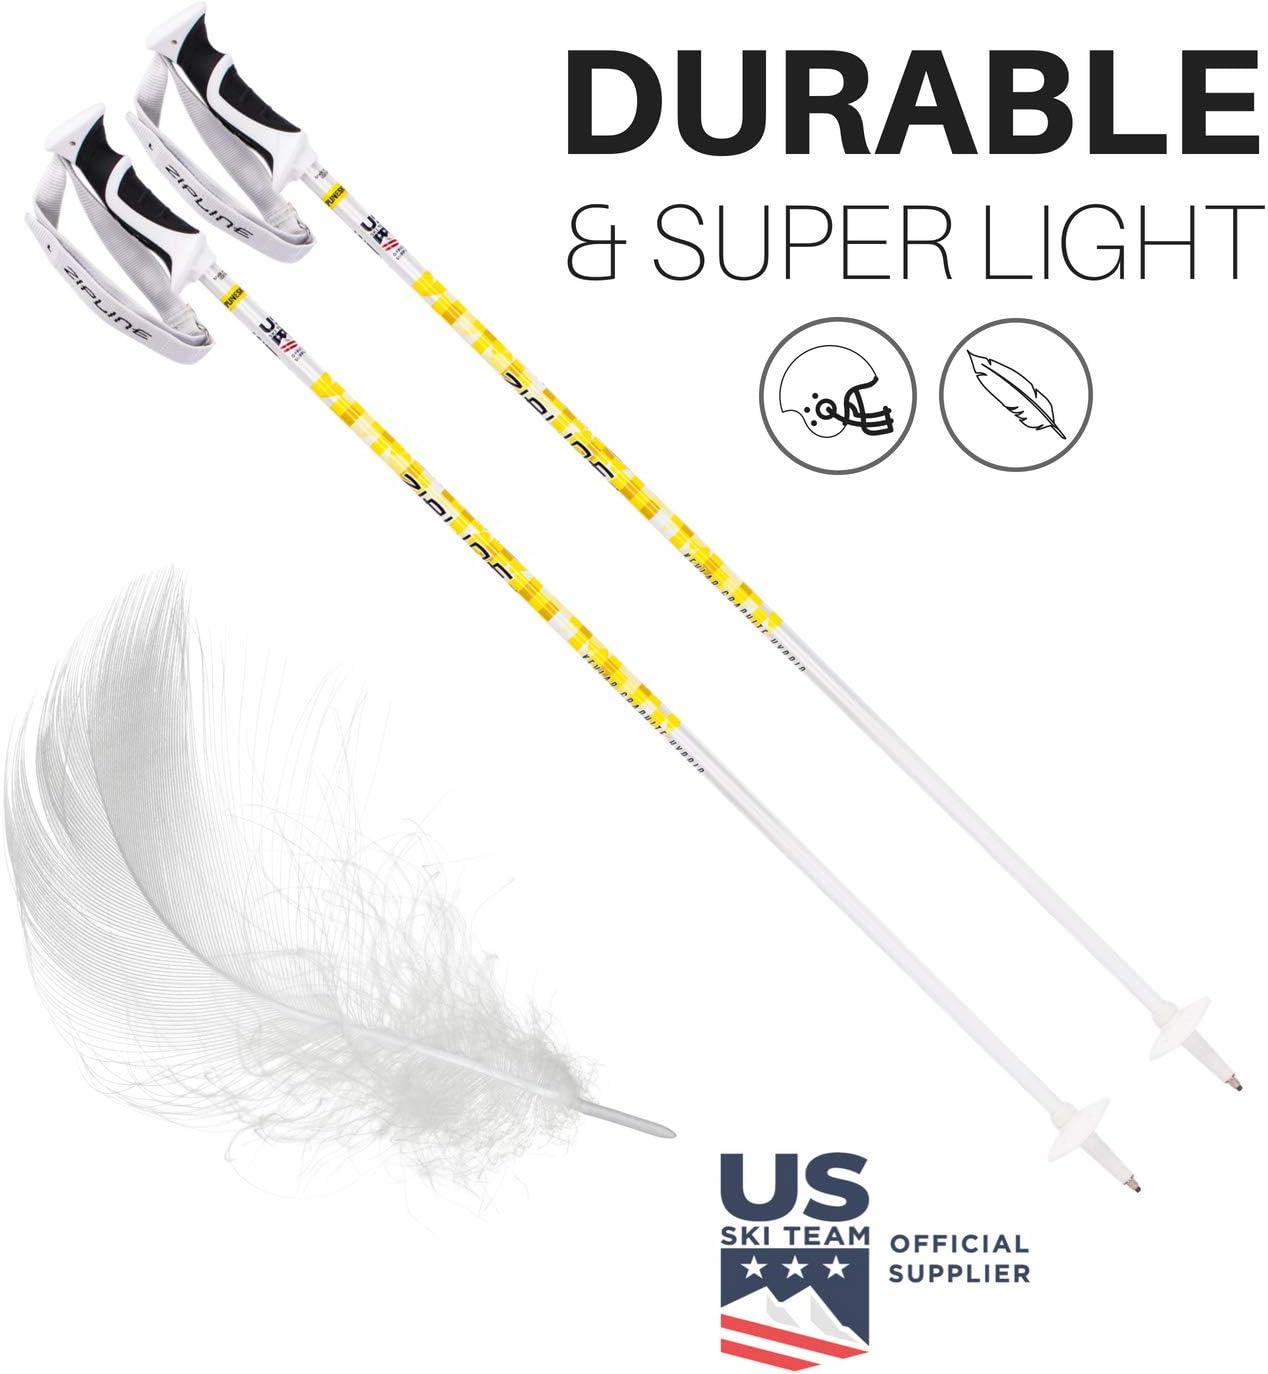 Ski Poles Zipline Graphite Hybrid Composite Podium 16.0 K Ski Team Official Supplier U.S